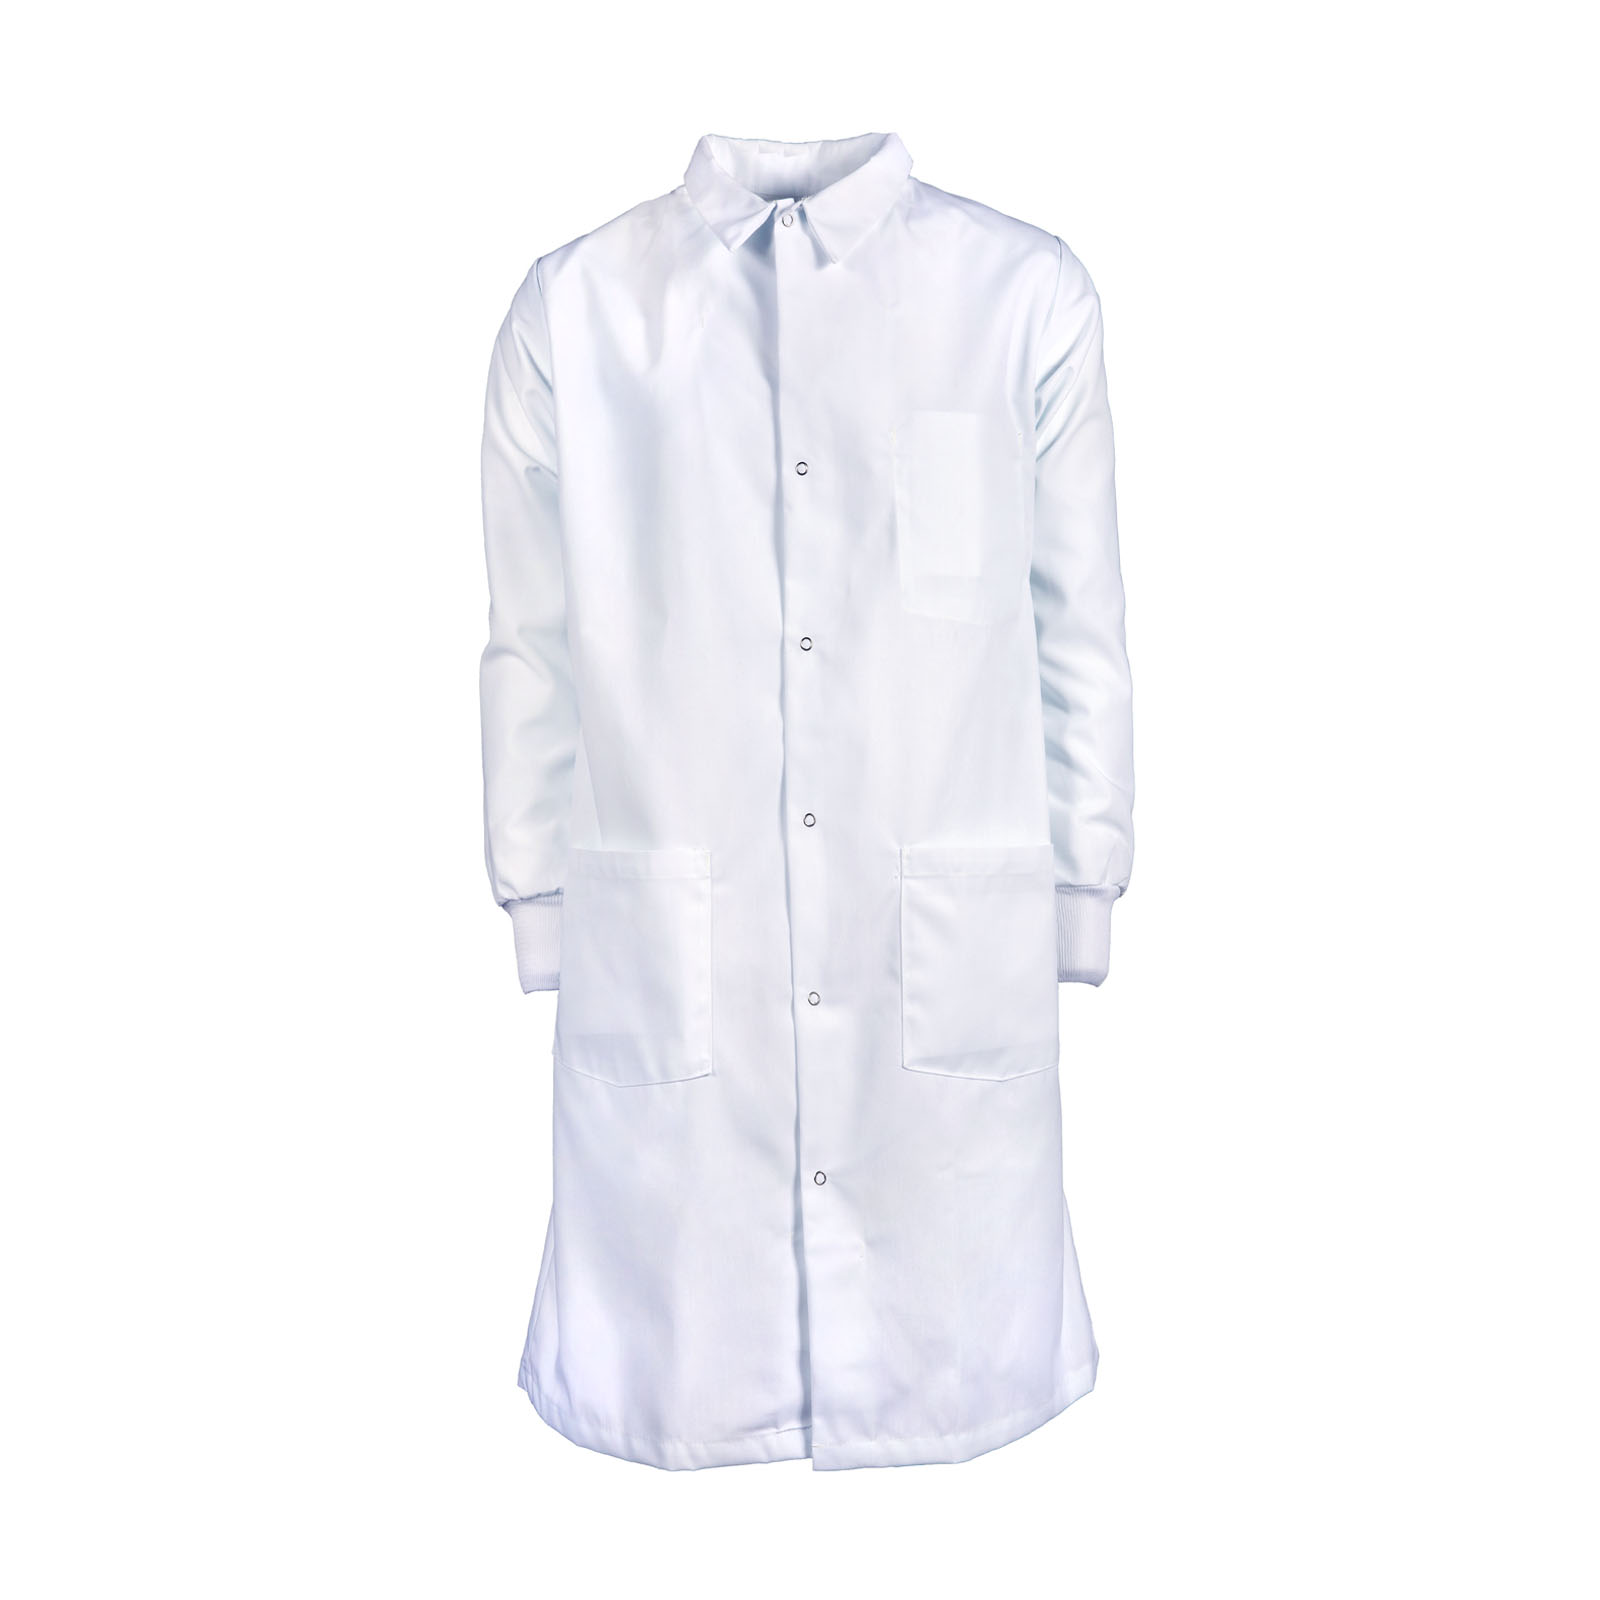 100% MJS Spun Polyester Precautionary Coat w/ Snaps-PINNACLE IMAGE